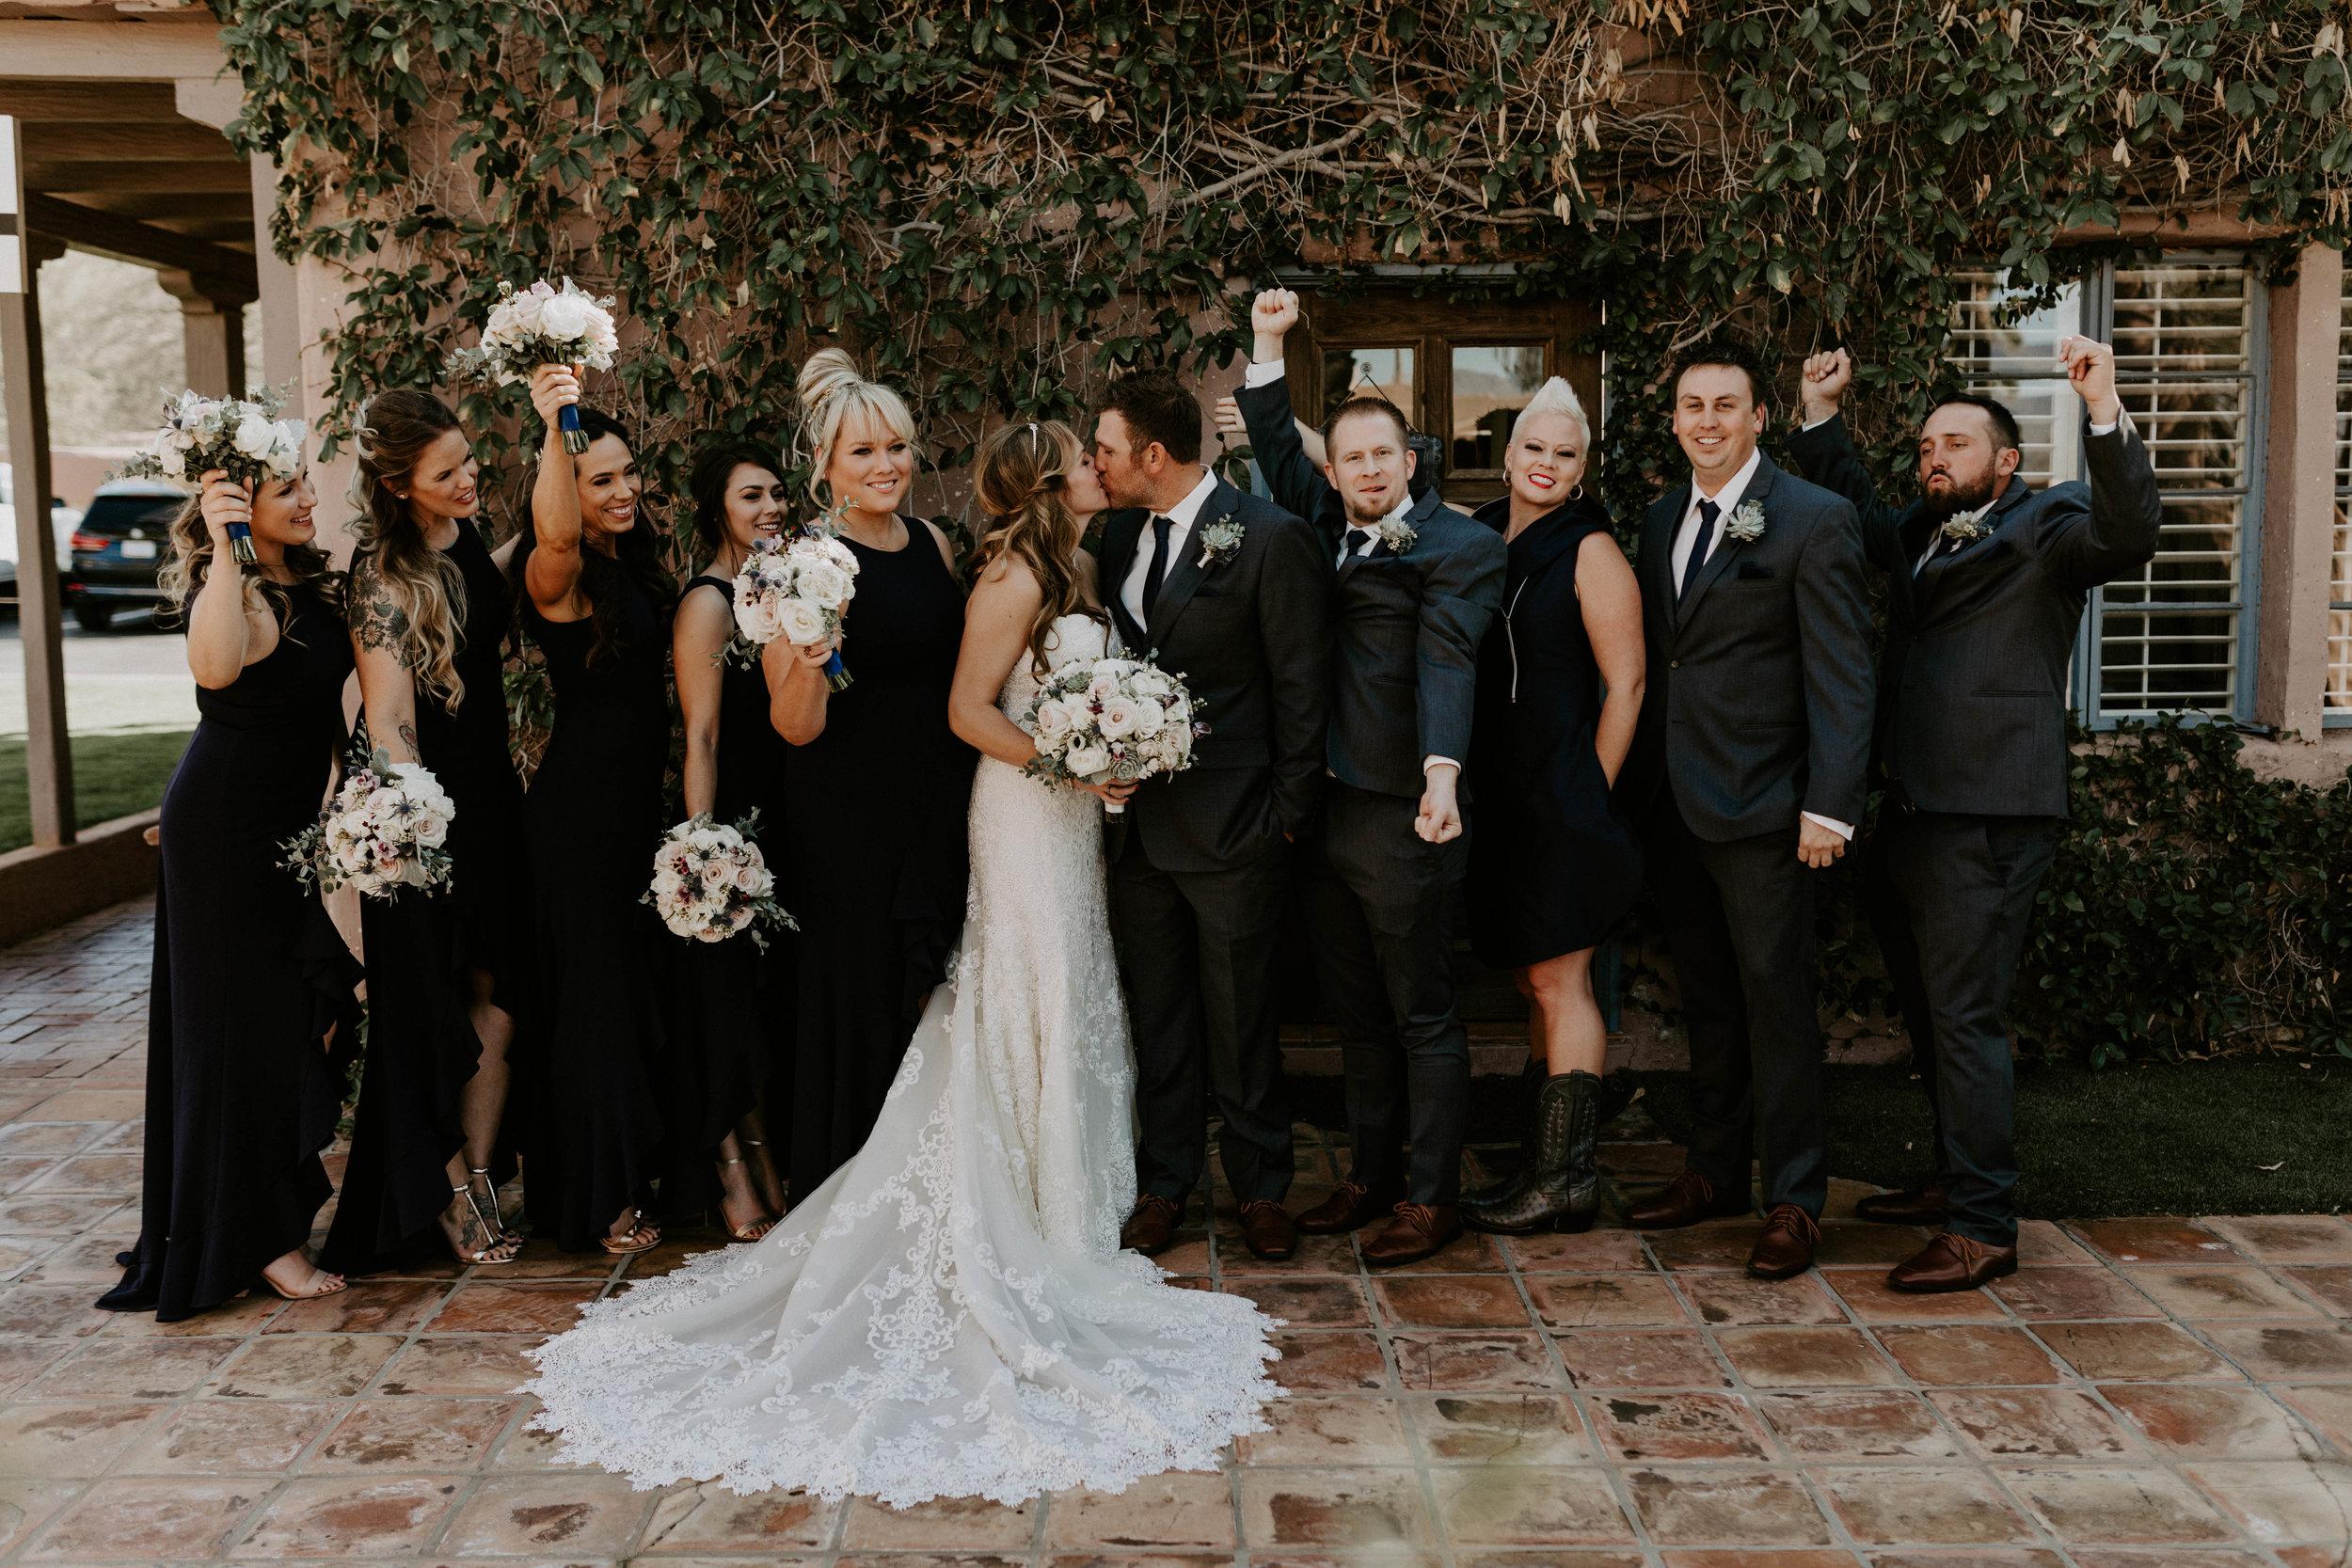 katieandbridgerwedding225.jpg